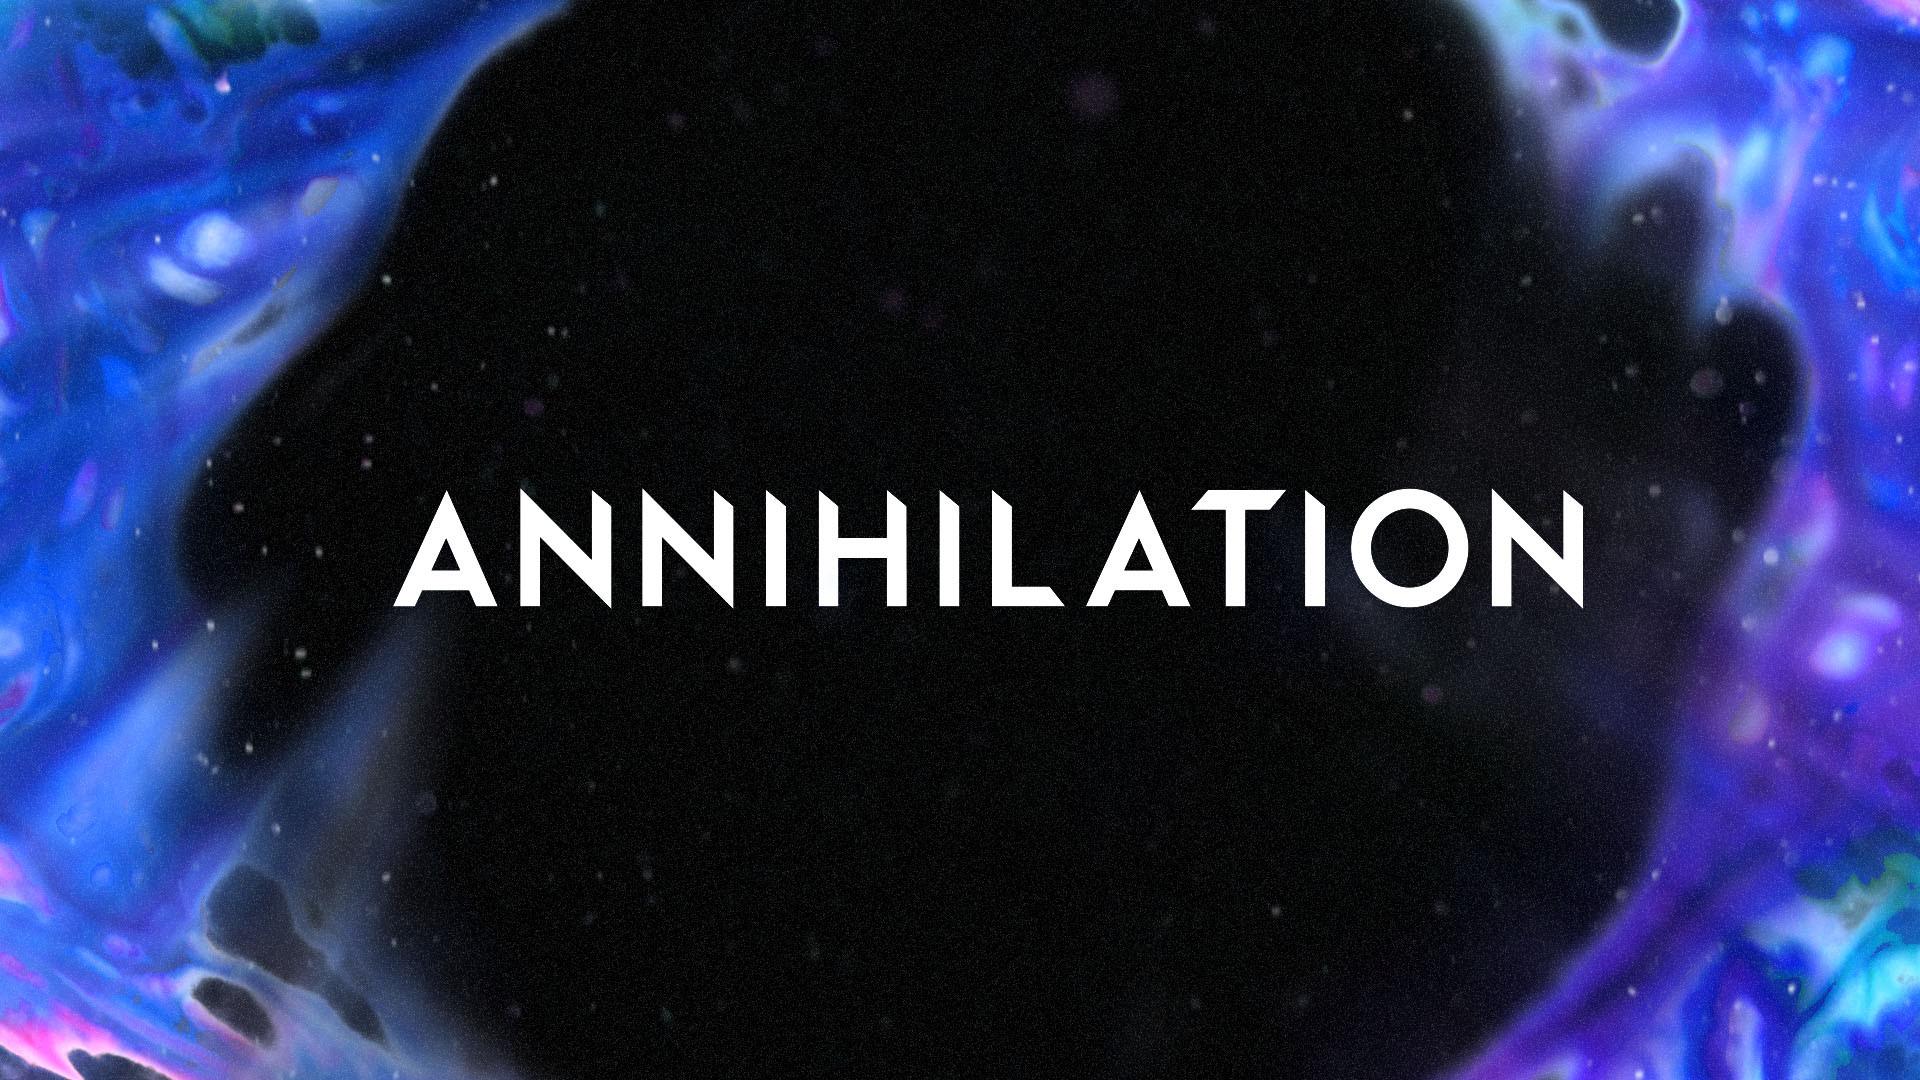 ANNIHILATION_STYLEFRAMES_Artboard 5.jpg